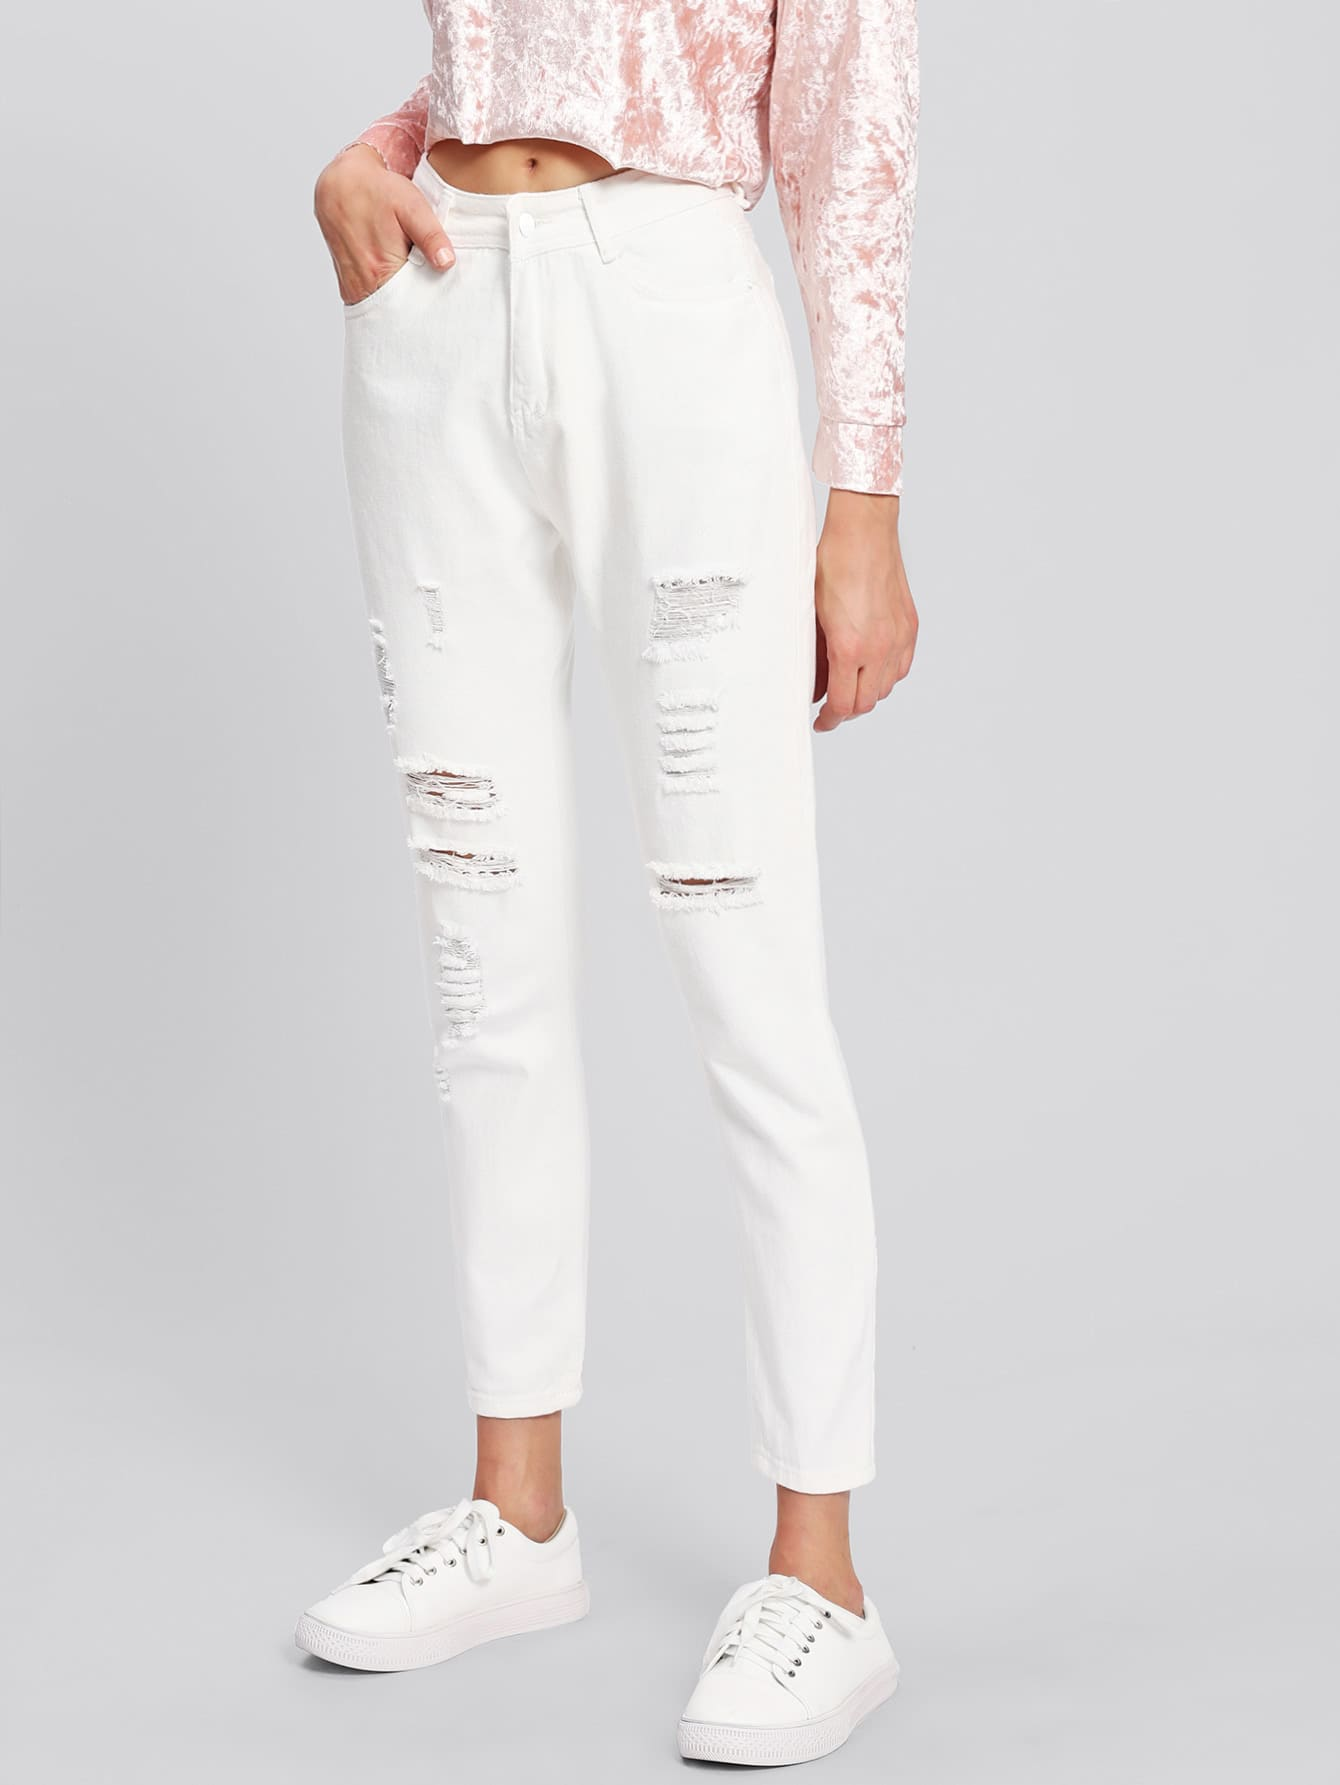 Ripped Front Jeans джеймс эшер bhakta ranga rasa india новый взгляд mp3